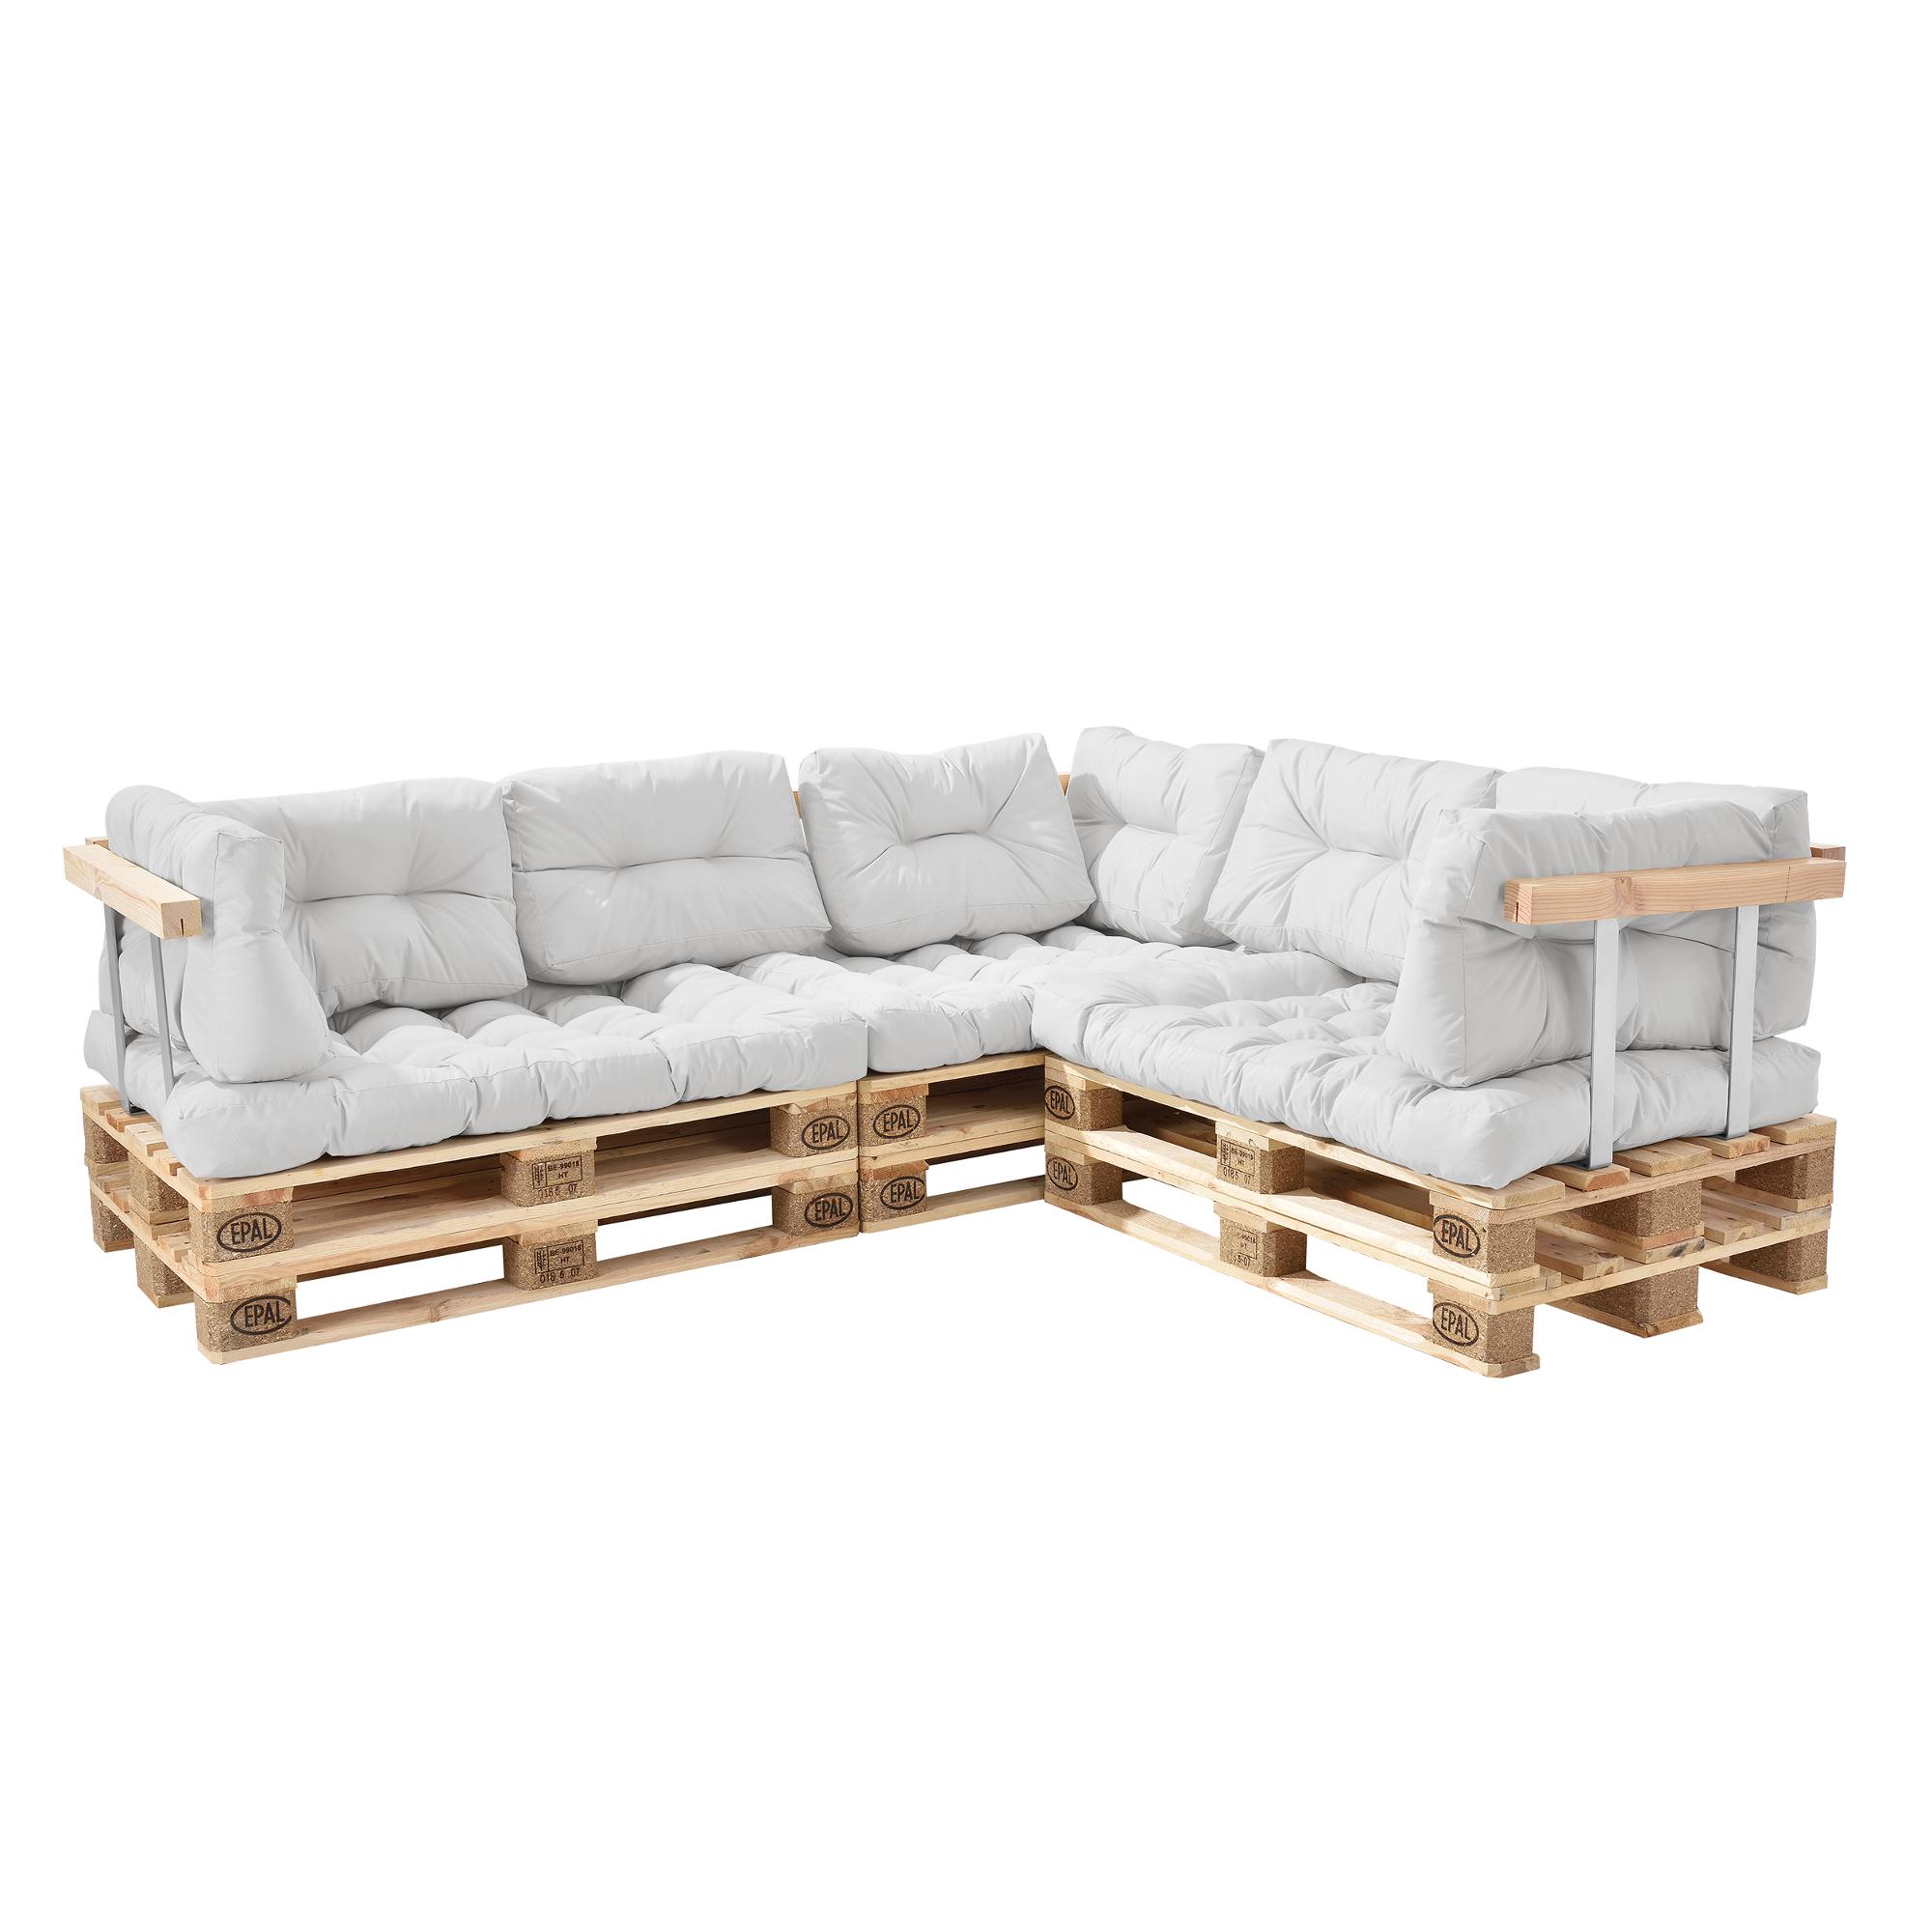 euro palettes canap coussin blanc d 39 angle rembourrage maigre ebay. Black Bedroom Furniture Sets. Home Design Ideas